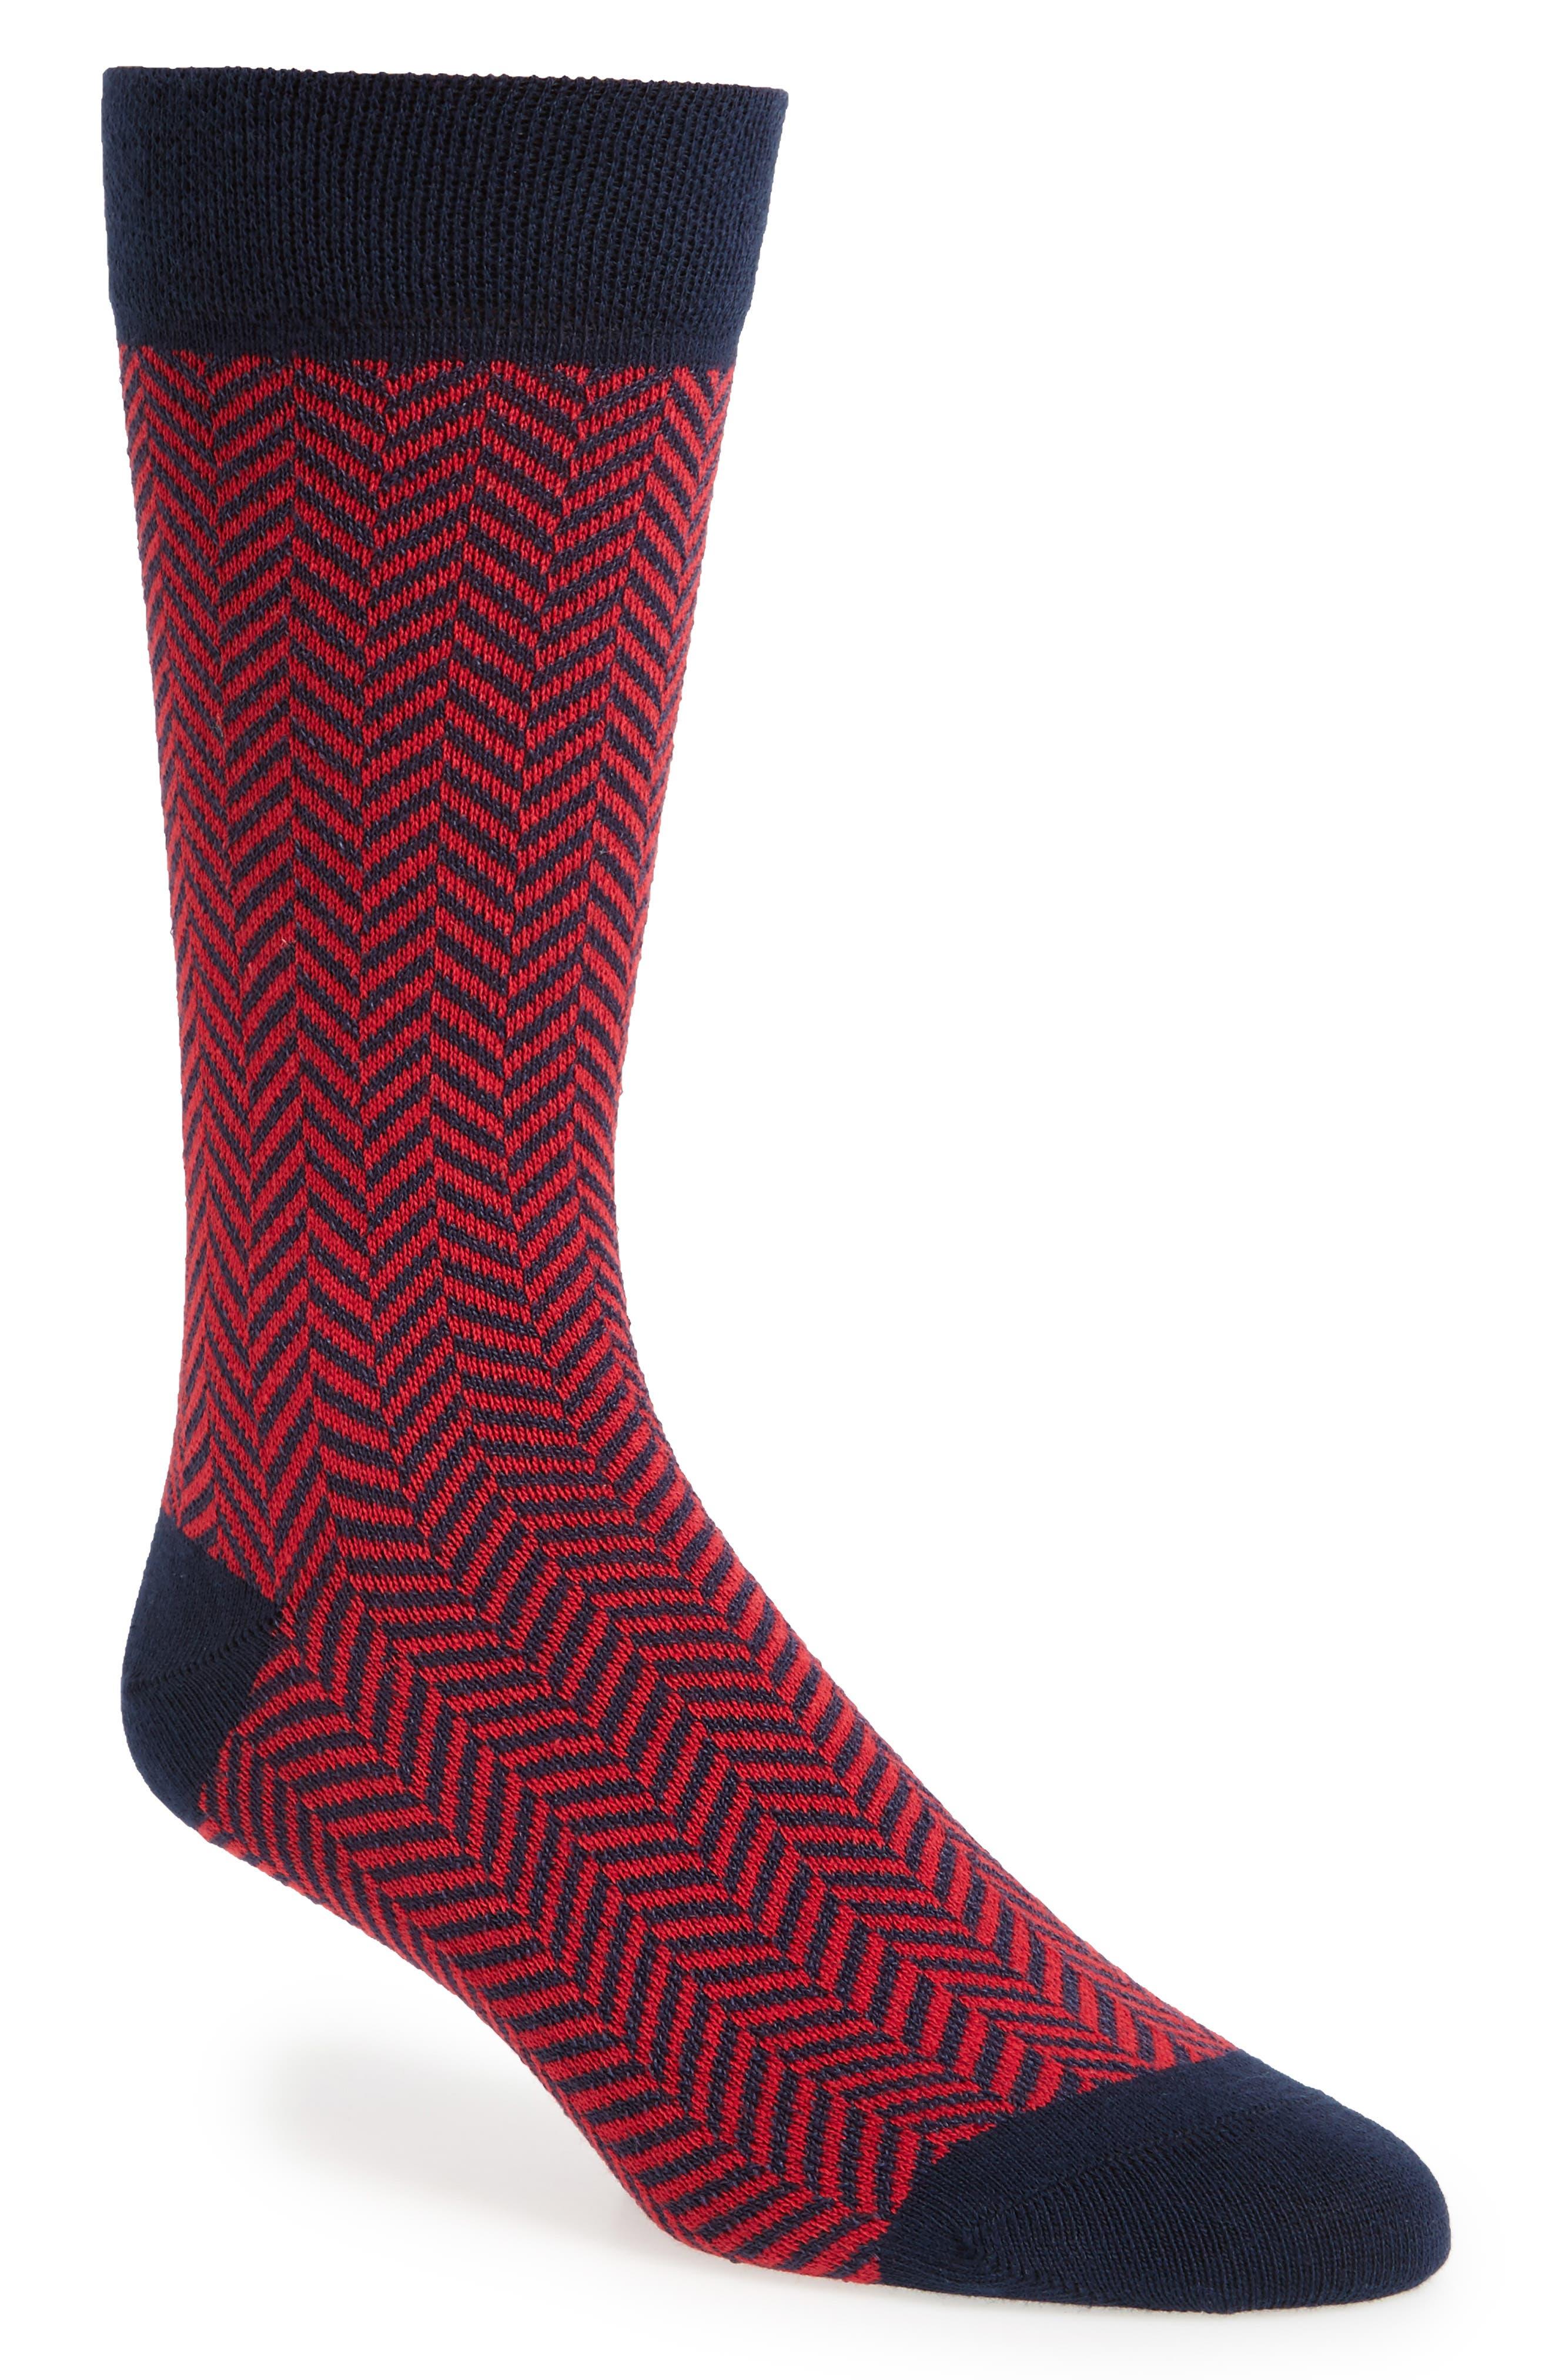 Ted Baker London Ronimow Herringbone Socks